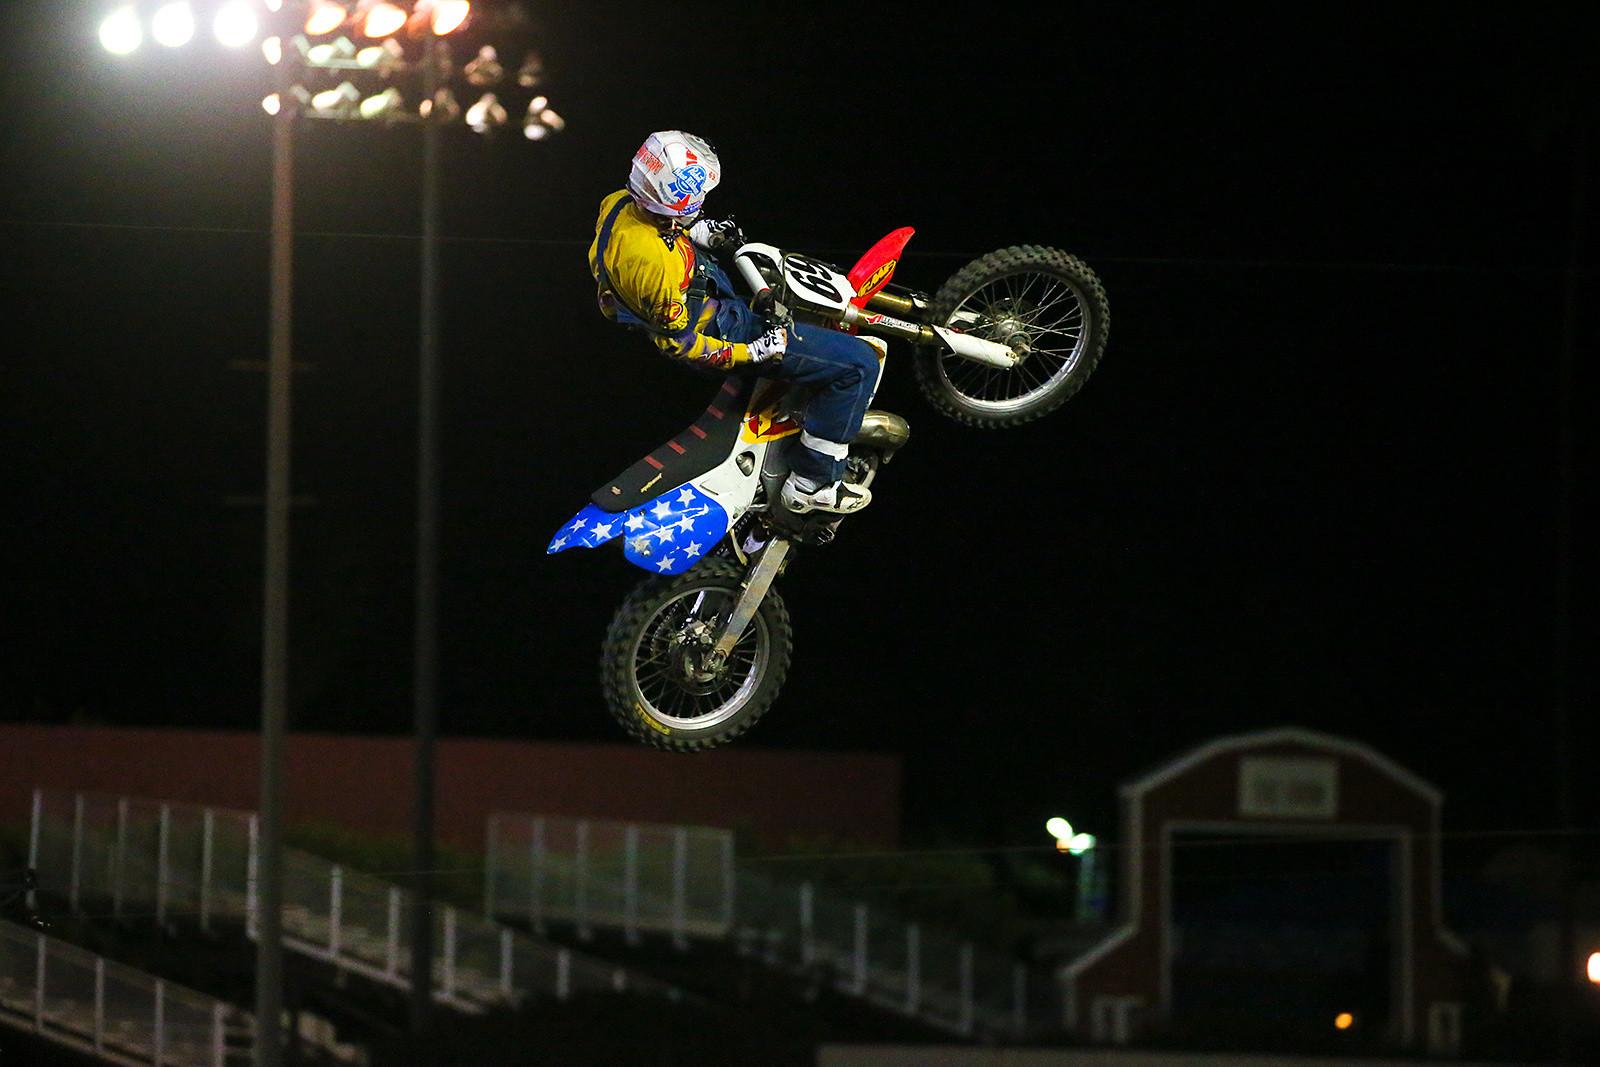 Ronnie Mac - Photo Blast: Red Bull Straight Rhythm - Motocross Pictures - Vital MX